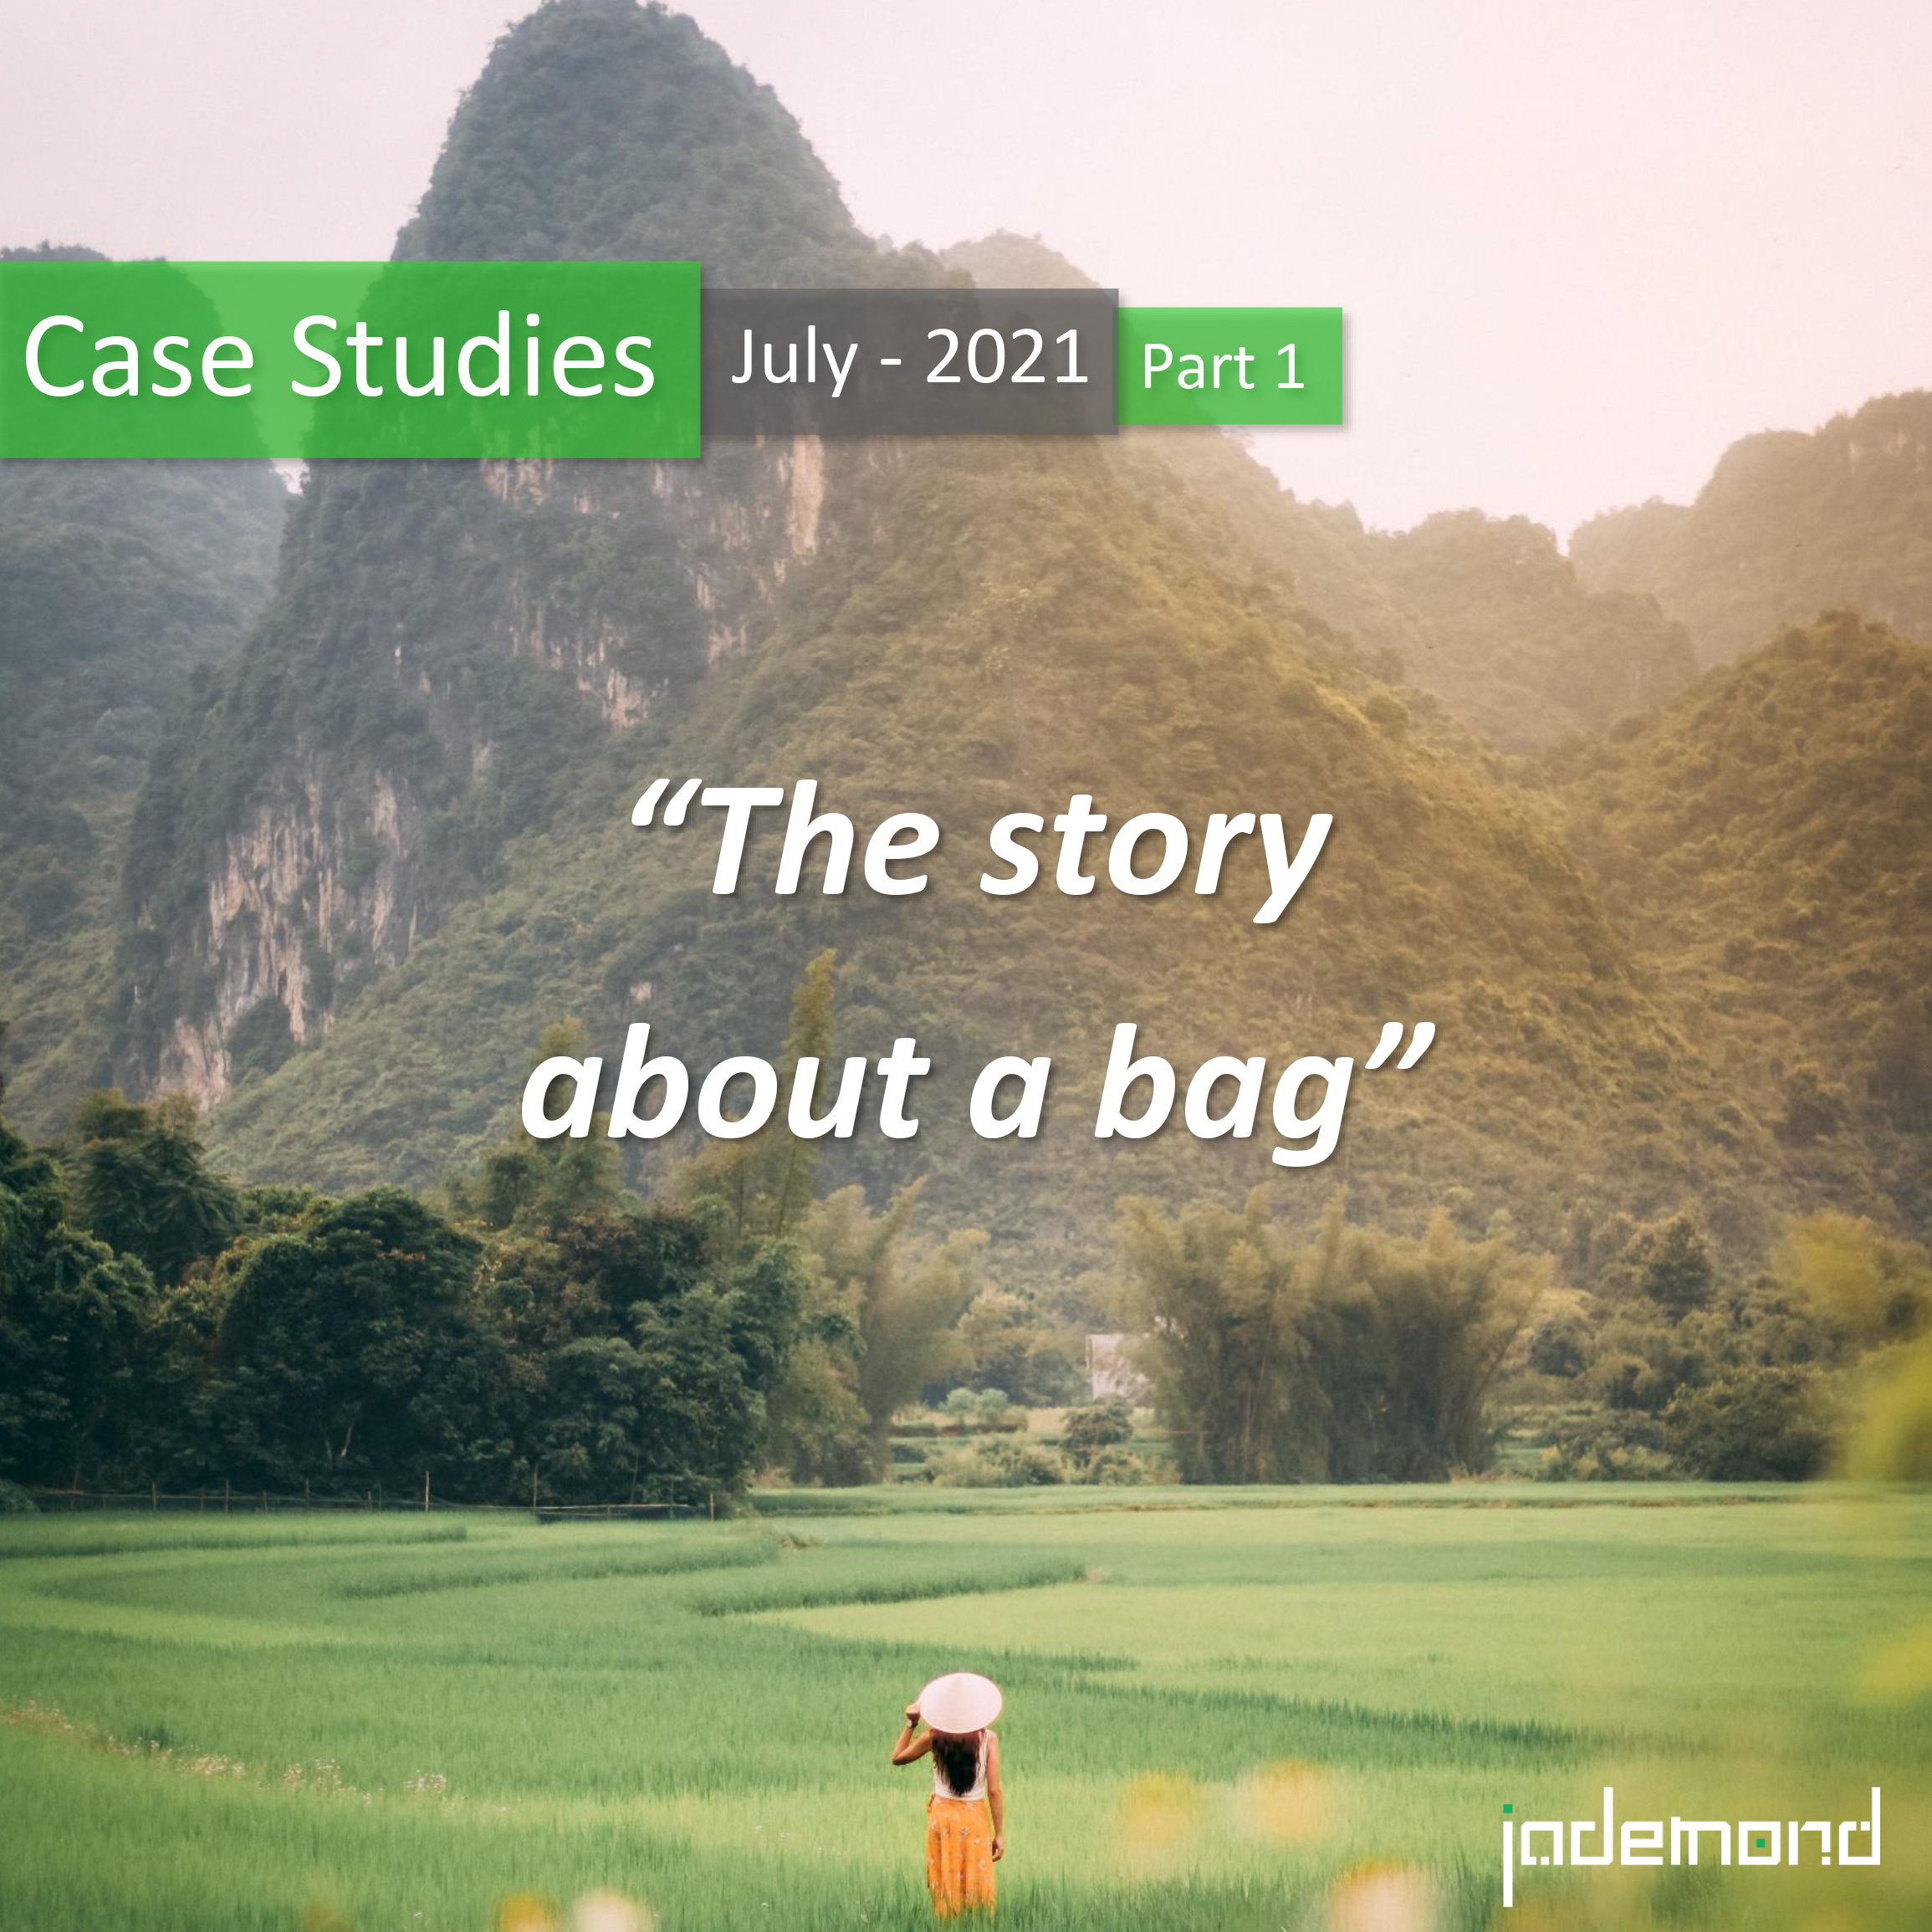 Jademond Case Study July 2021